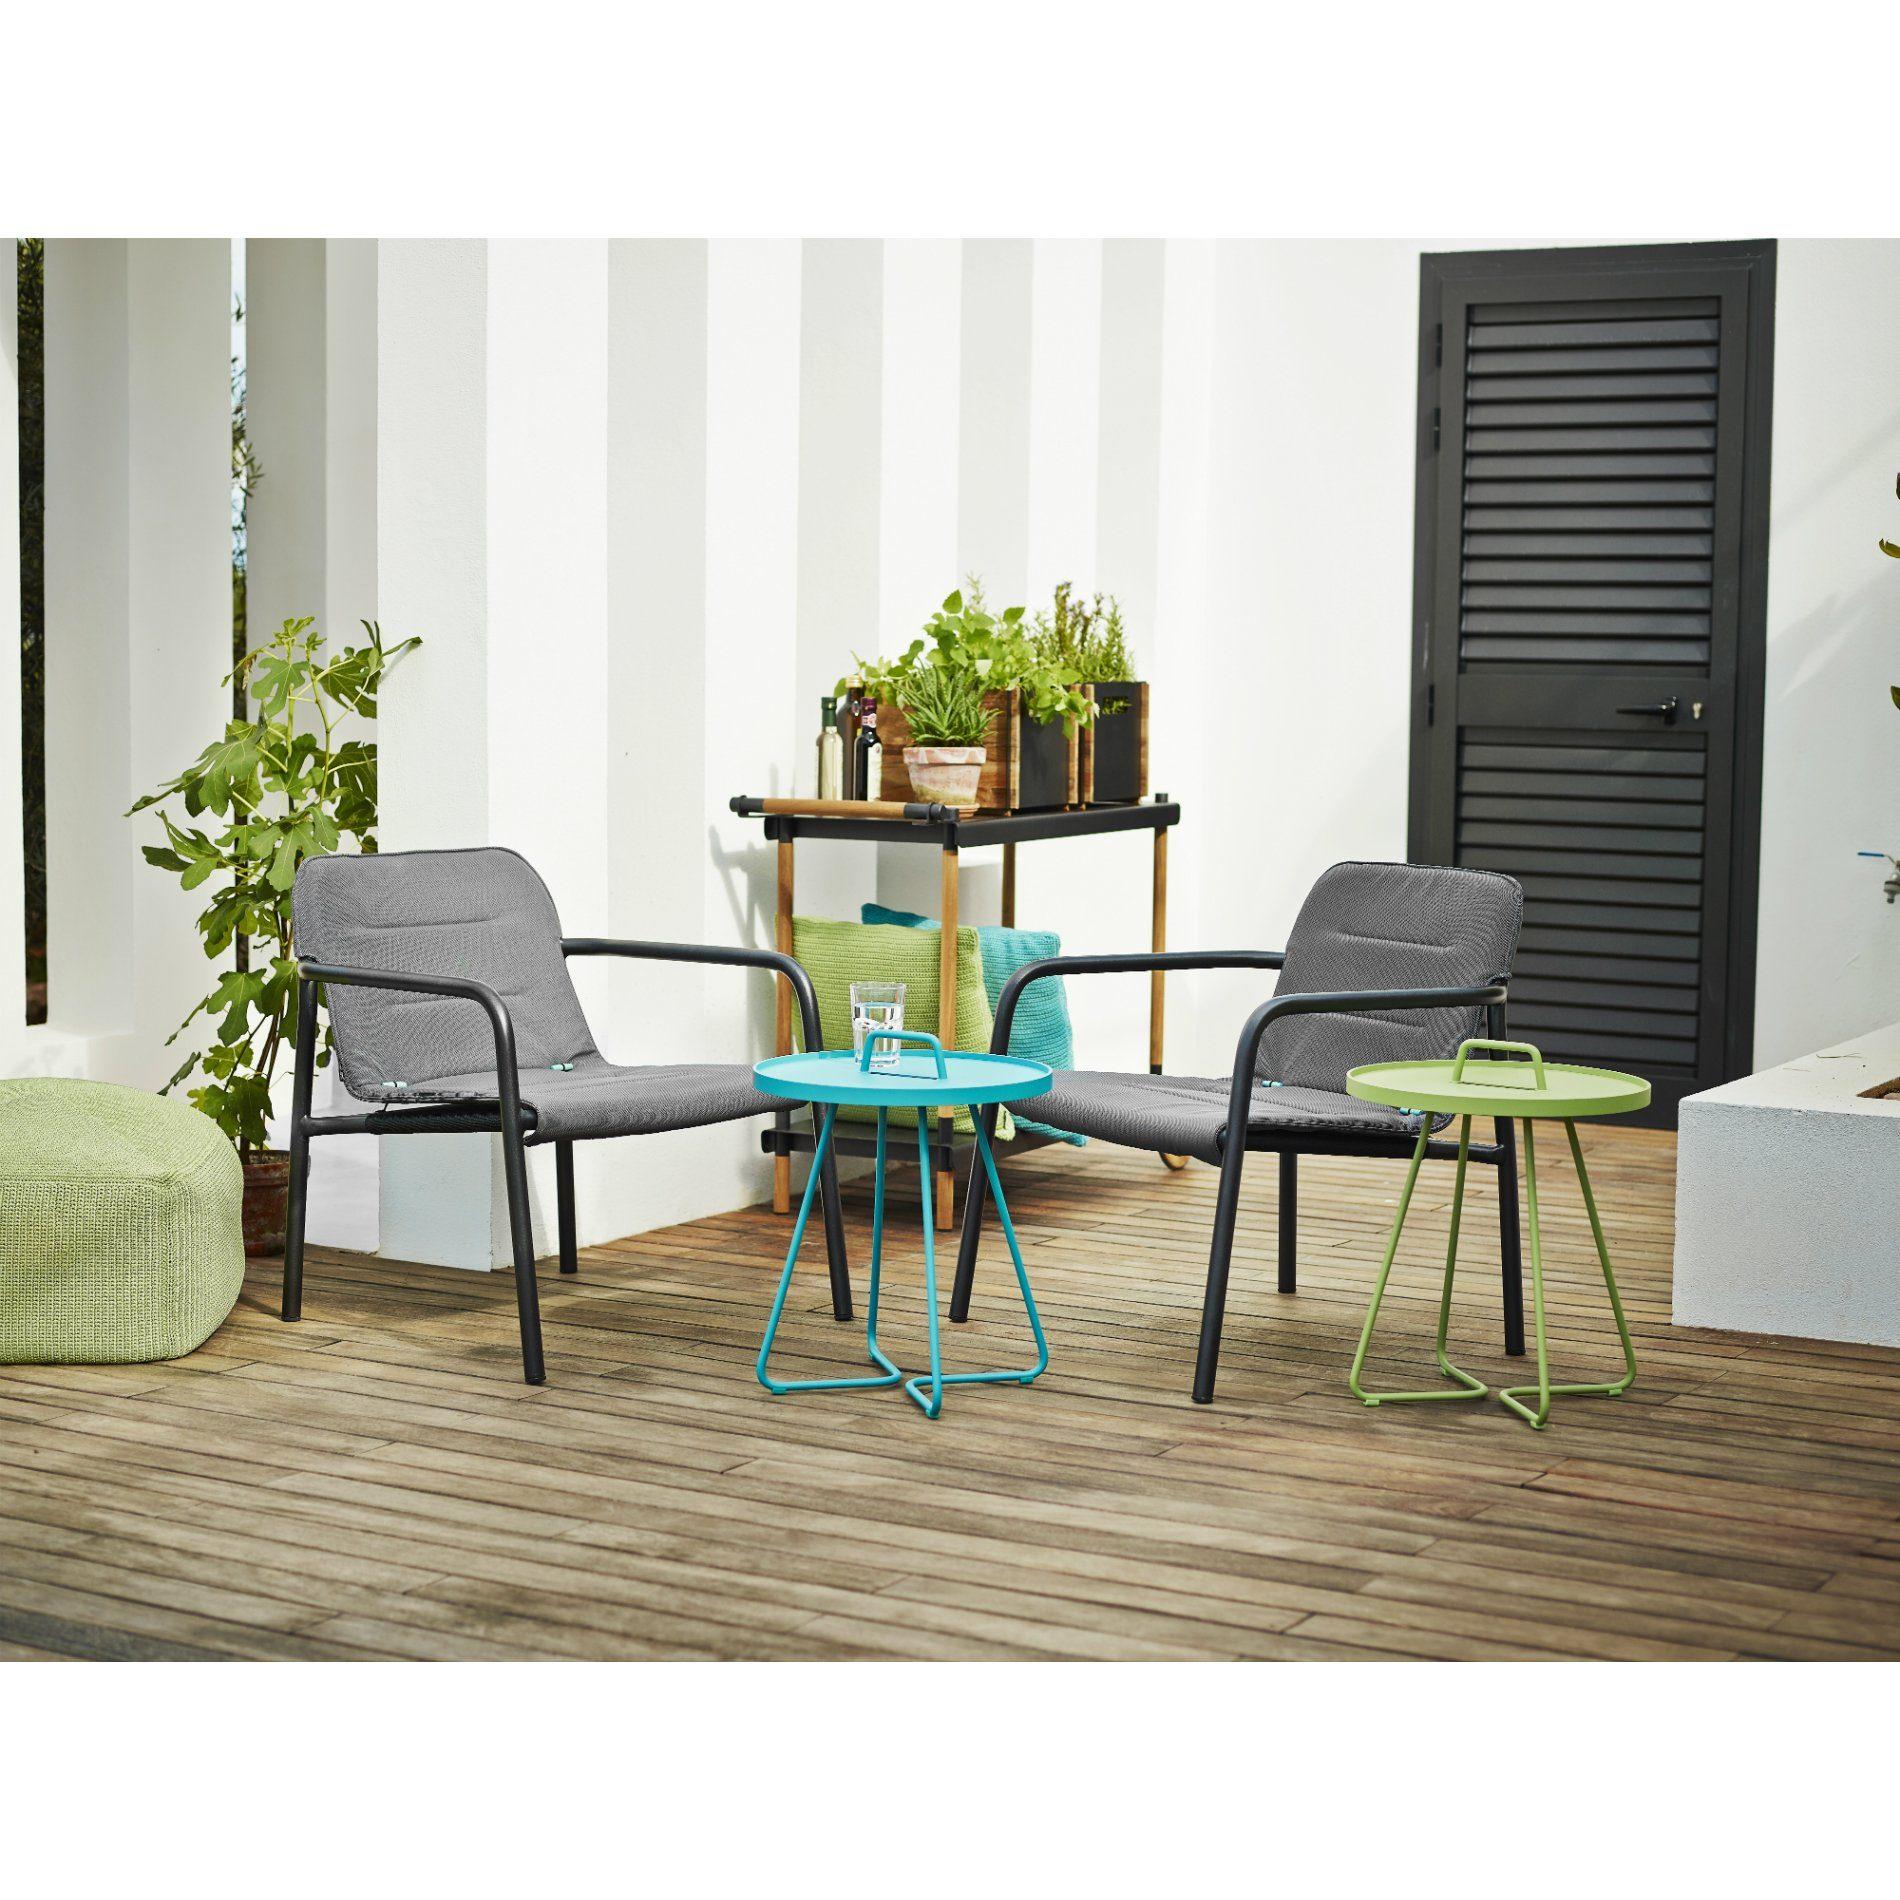 cane line loungeserie kapa loungesessel. Black Bedroom Furniture Sets. Home Design Ideas